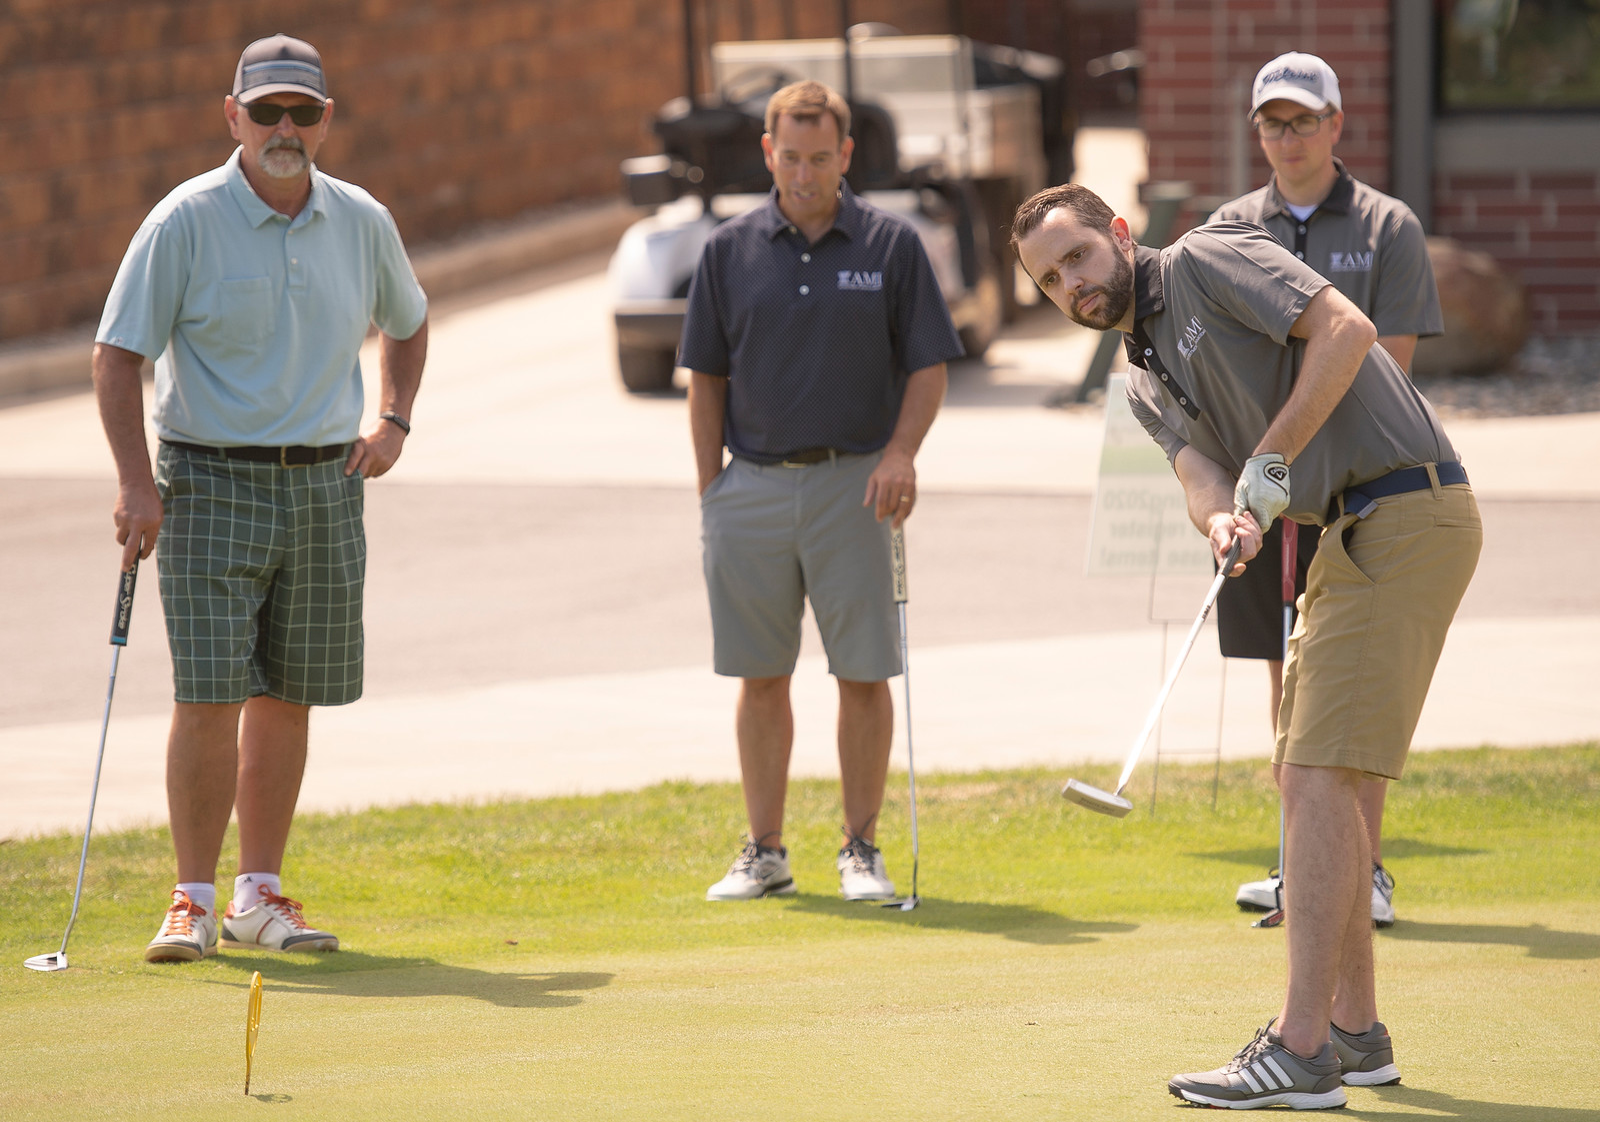 2020_golf_outing_ND40601.jpg